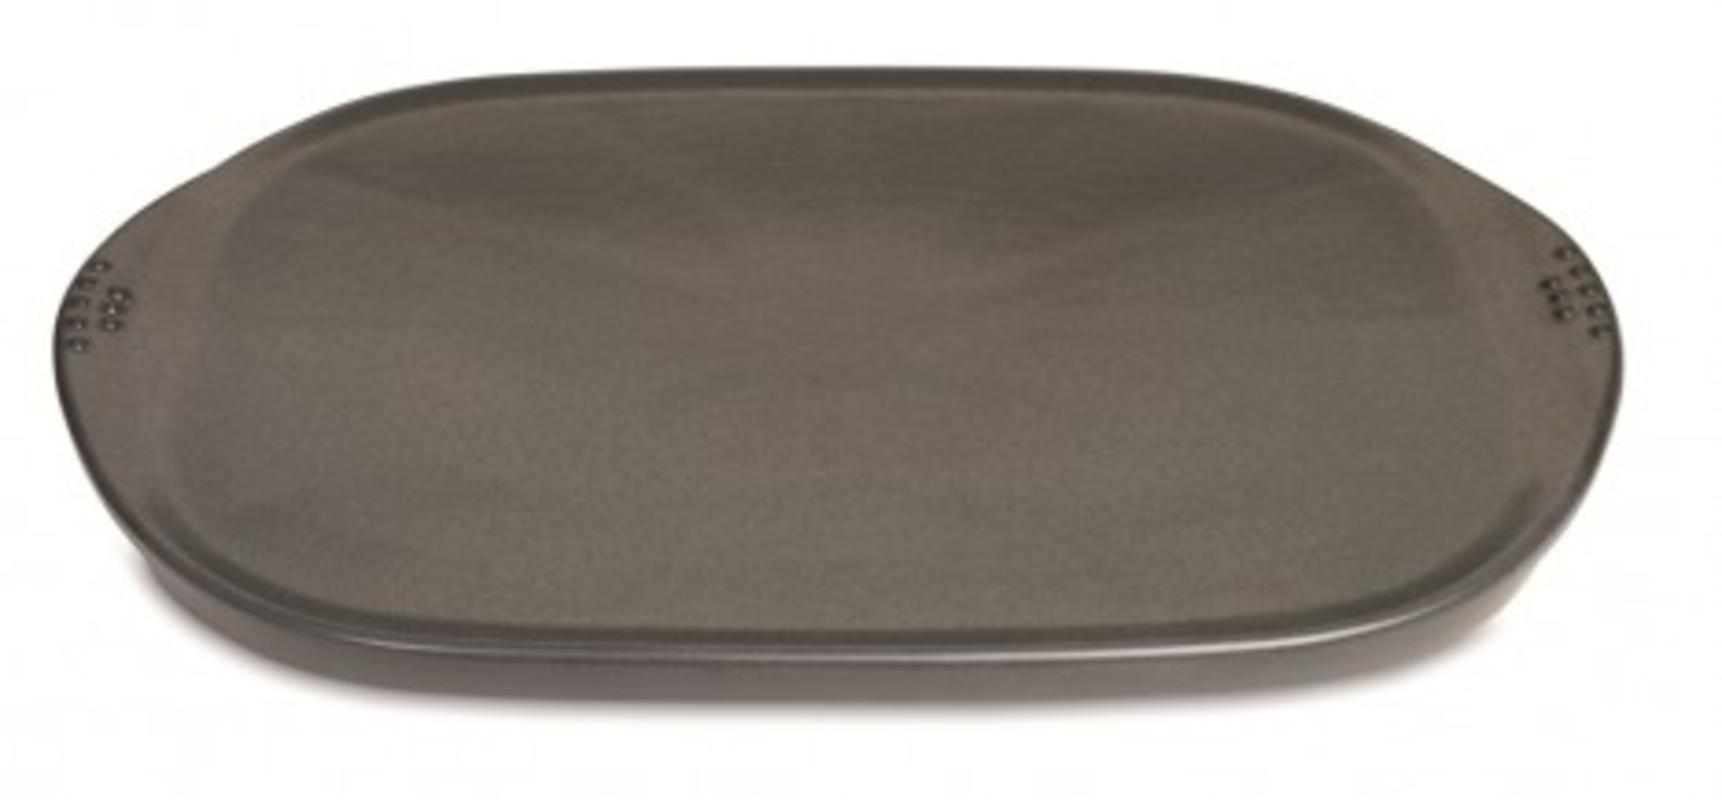 WEBER-17509-Keramicna-plosca-velika.jpg